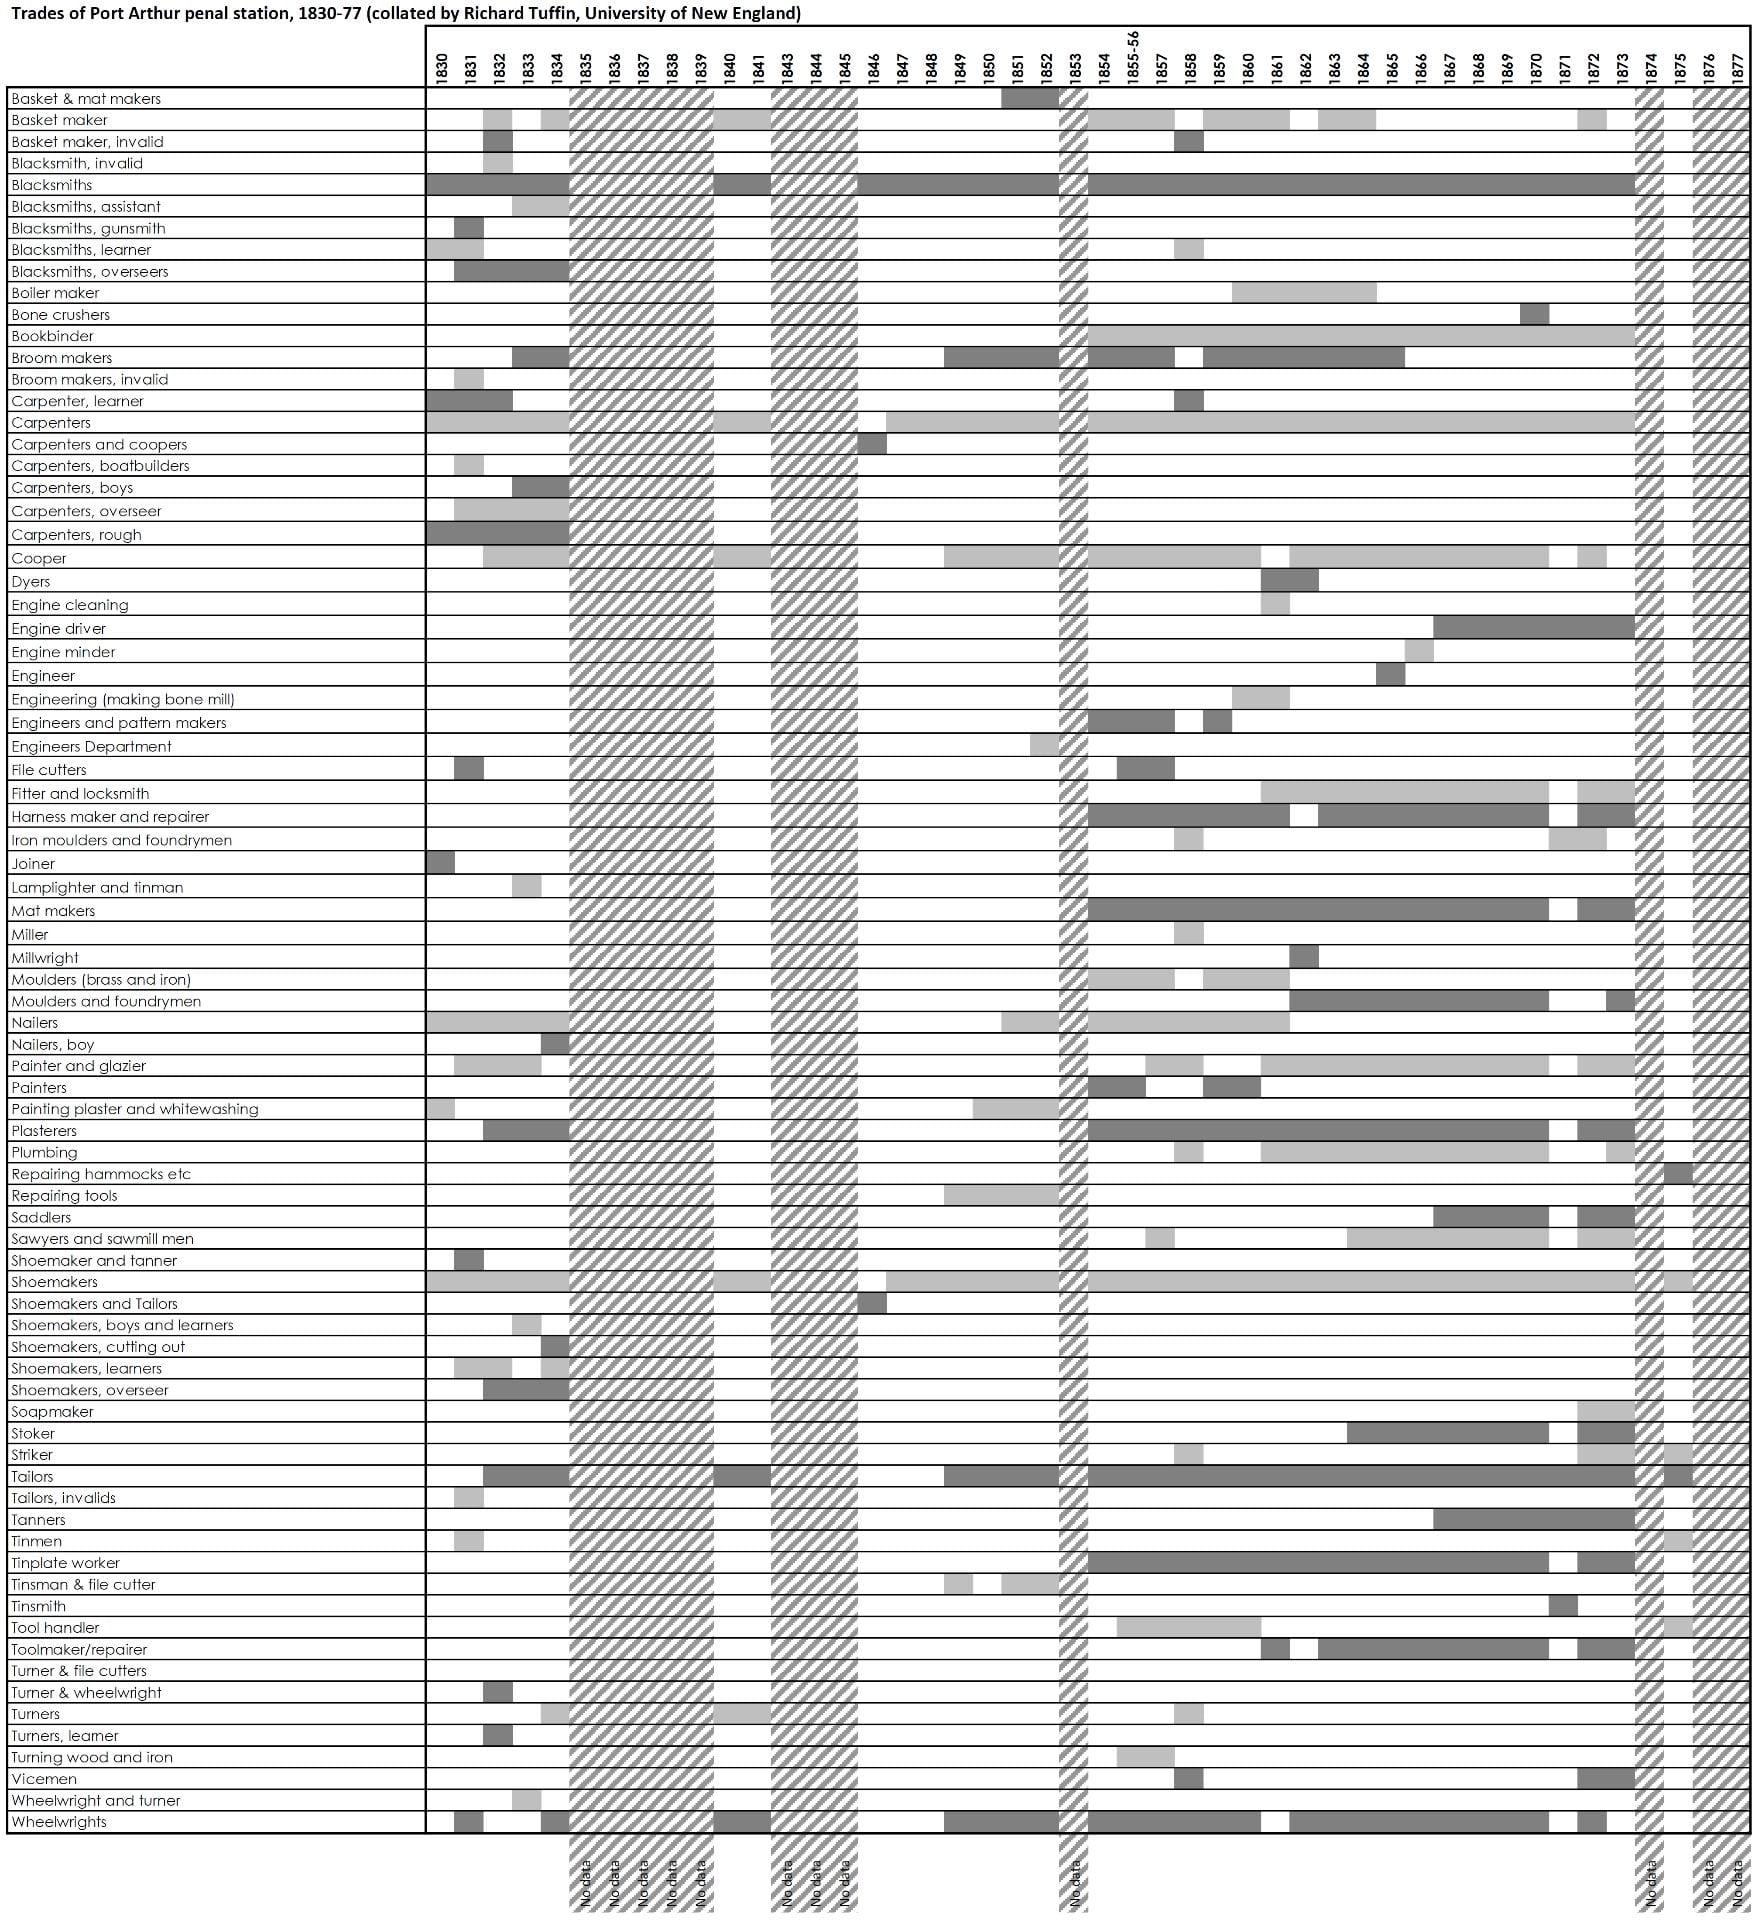 Port Arthur trades list, 1830-77